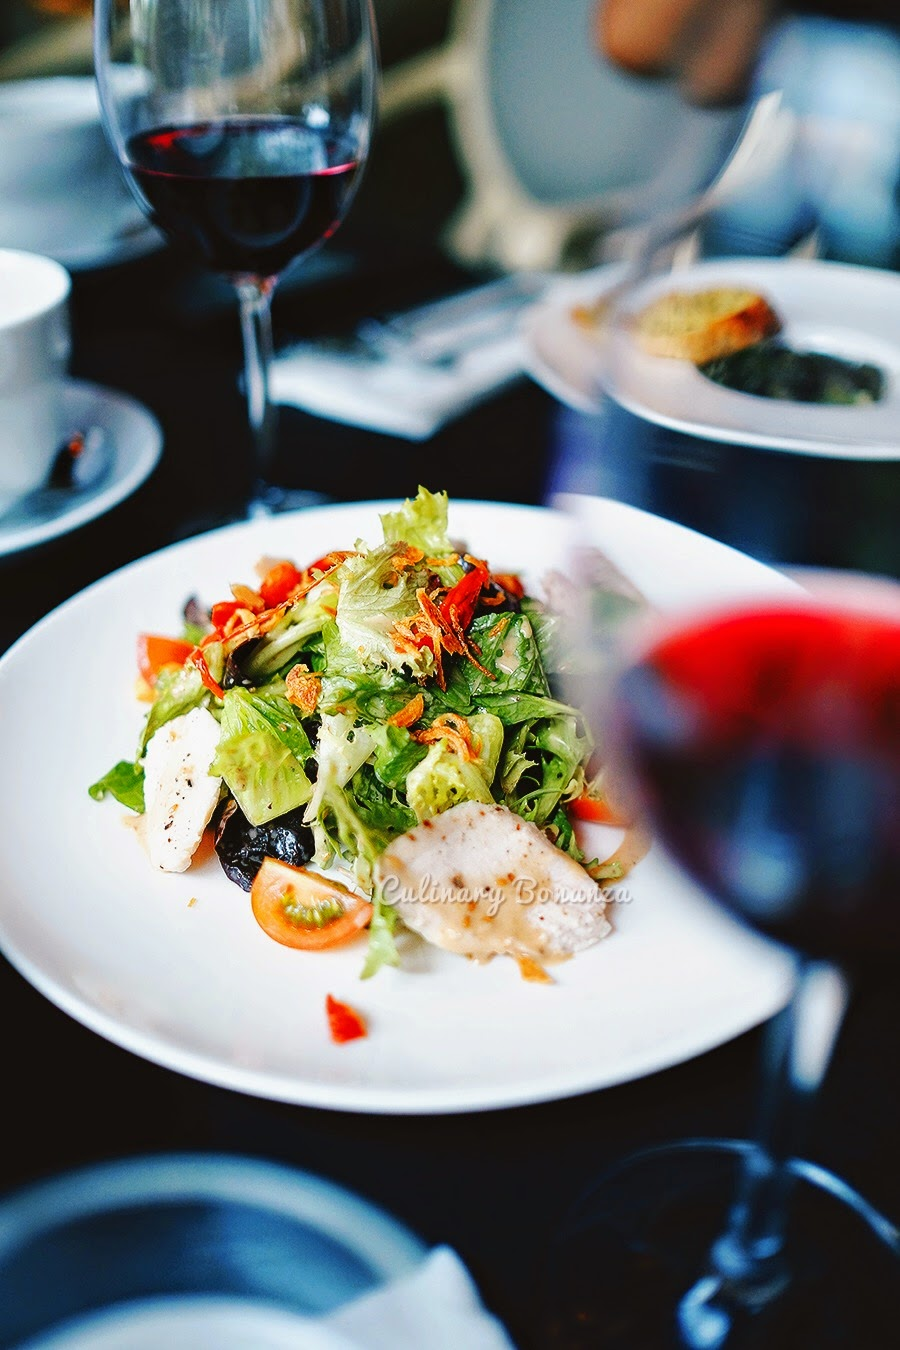 Salade Avec Moi - fresh mesclun, roasted tomatoes, grilled chicken & Avec Moi house dressing.